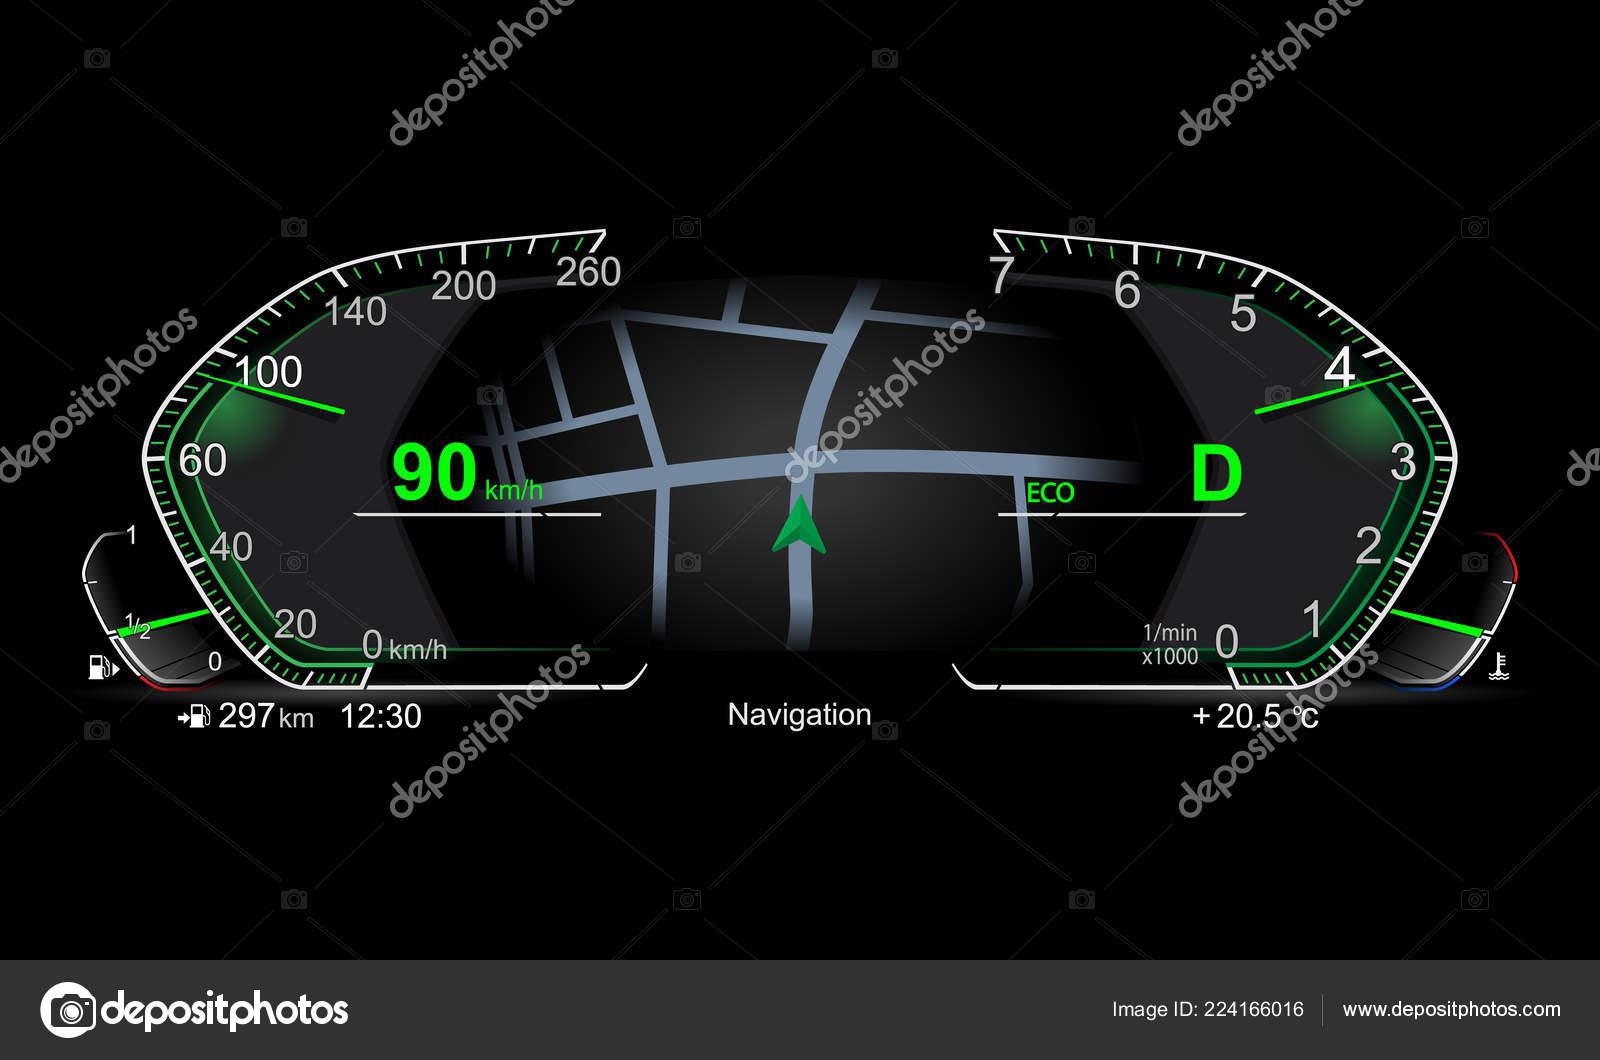 Car Dashboard Diagram Realistic Electronic Car Dashboard Stock Vector Chel11 224166016